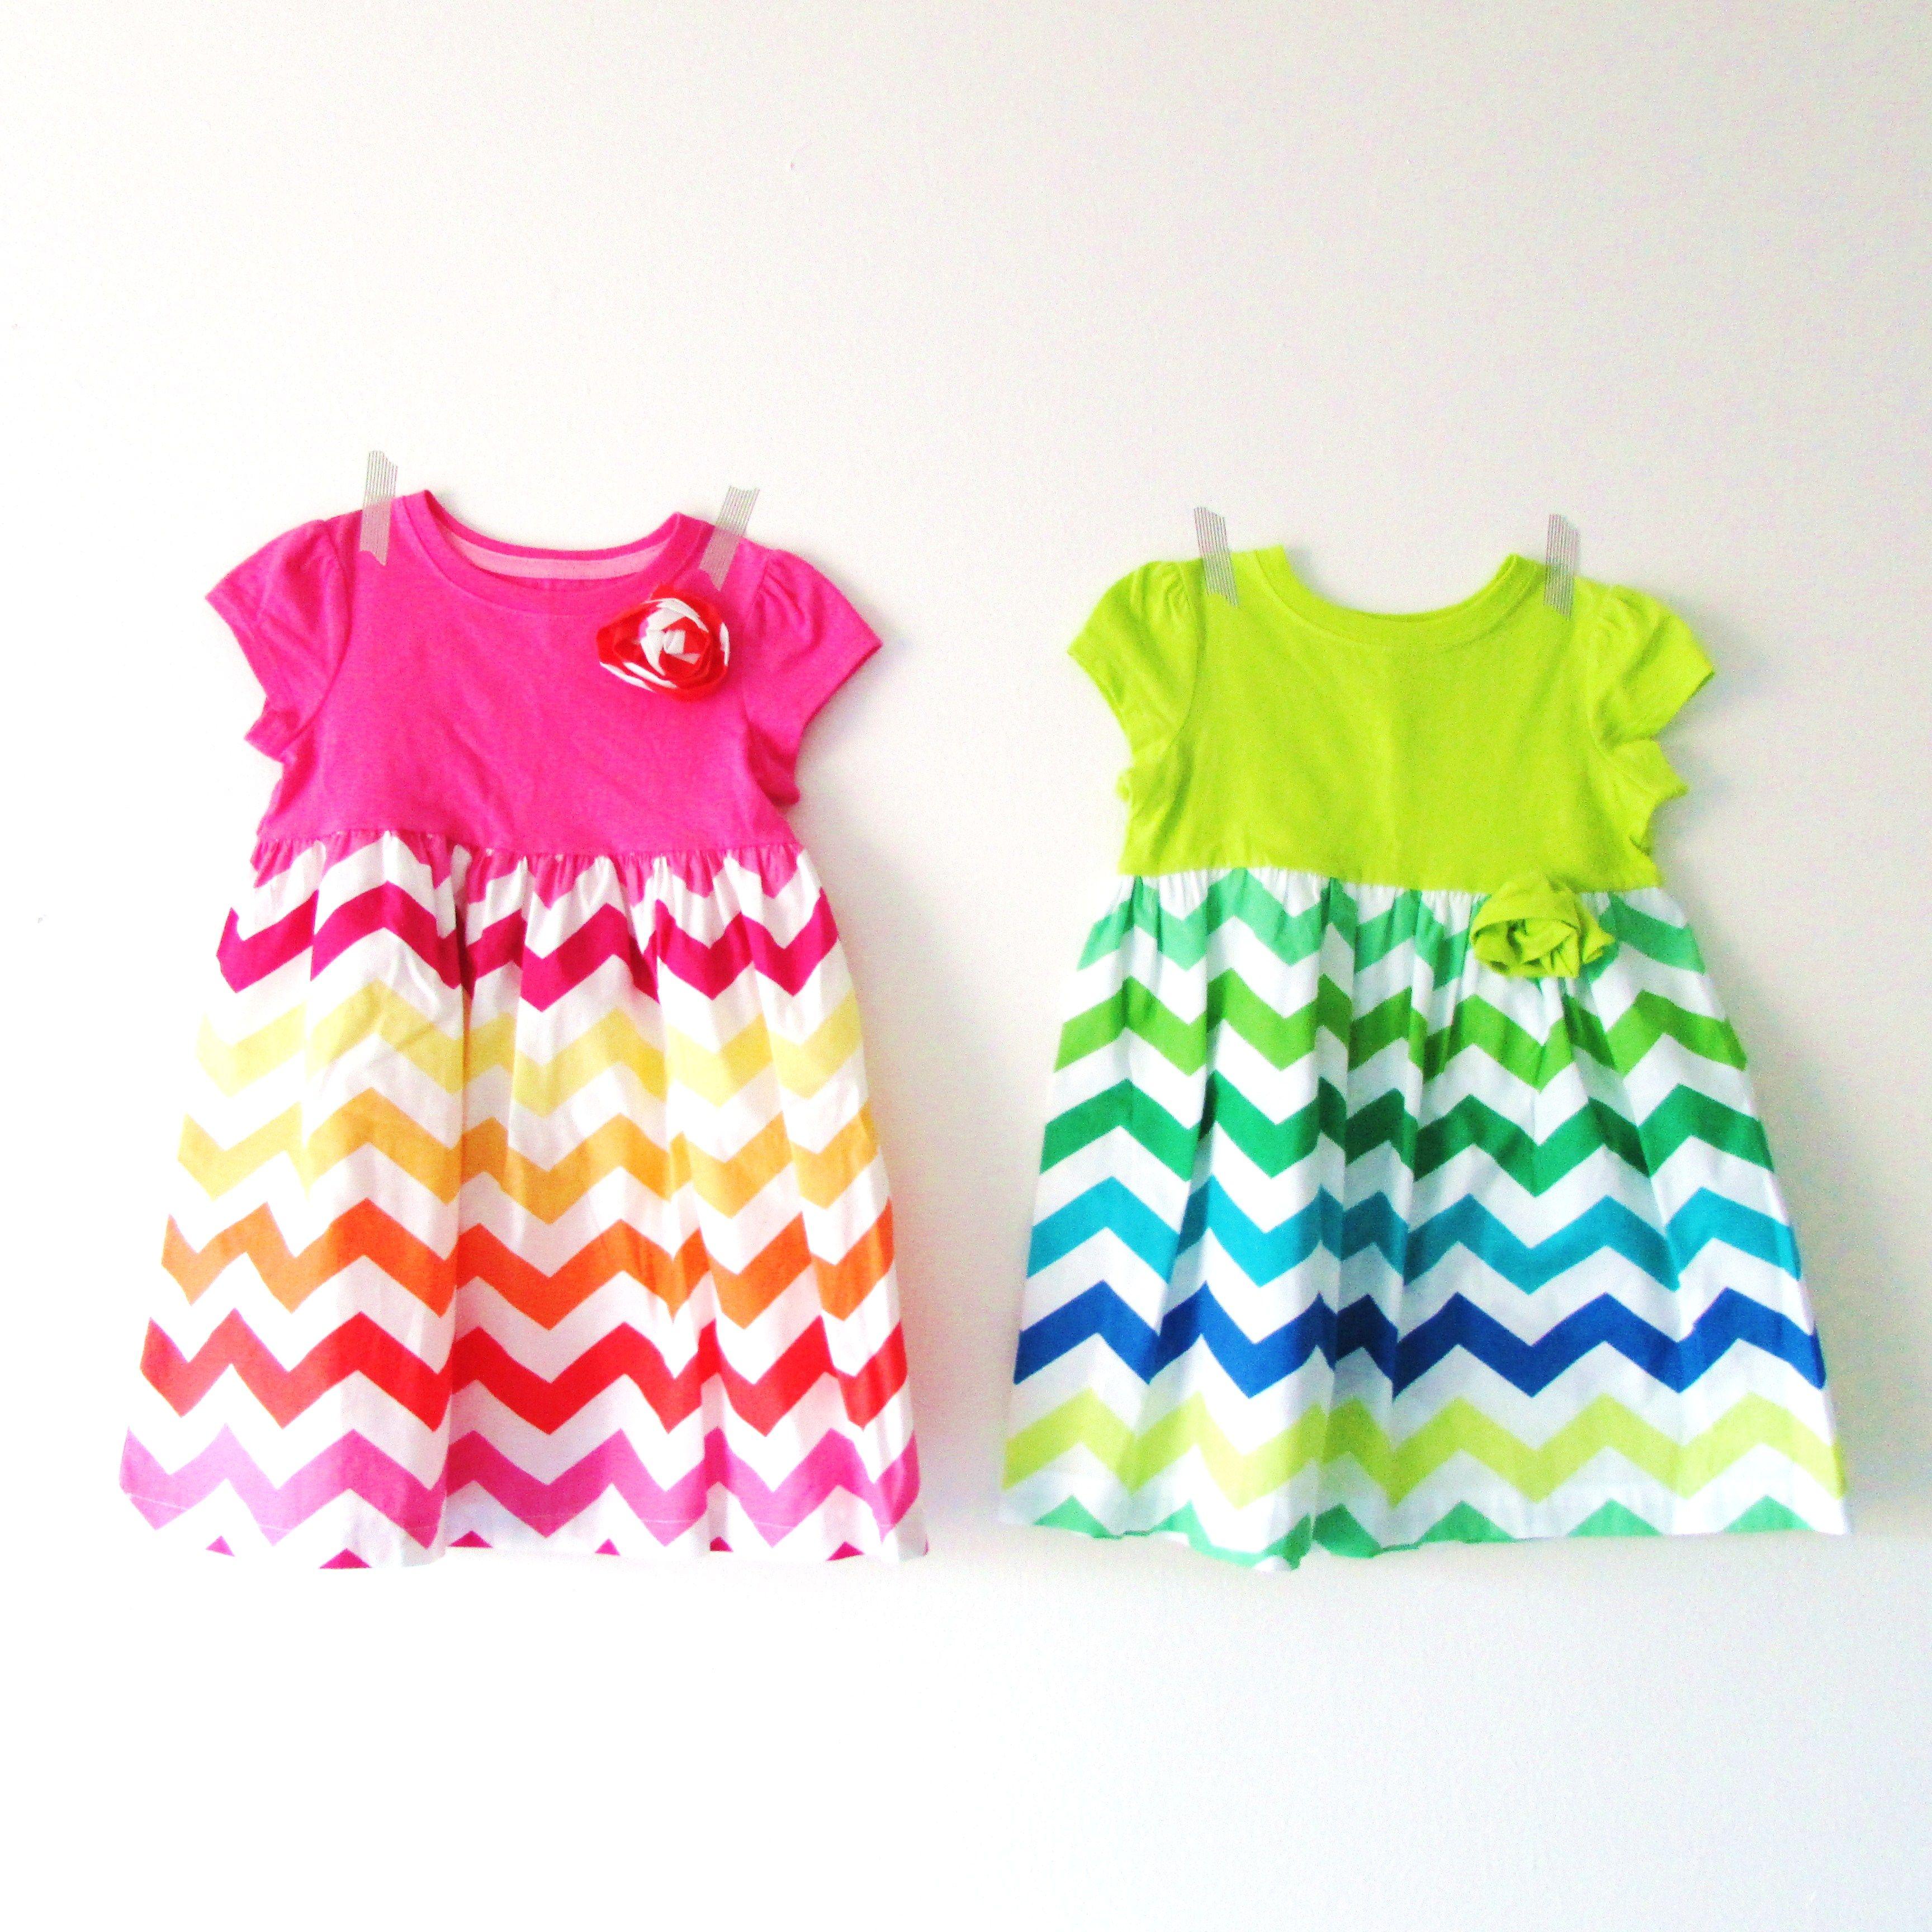 The easy tee shirt dress shirt dress tutorials sewing for Easy to make t shirt dress